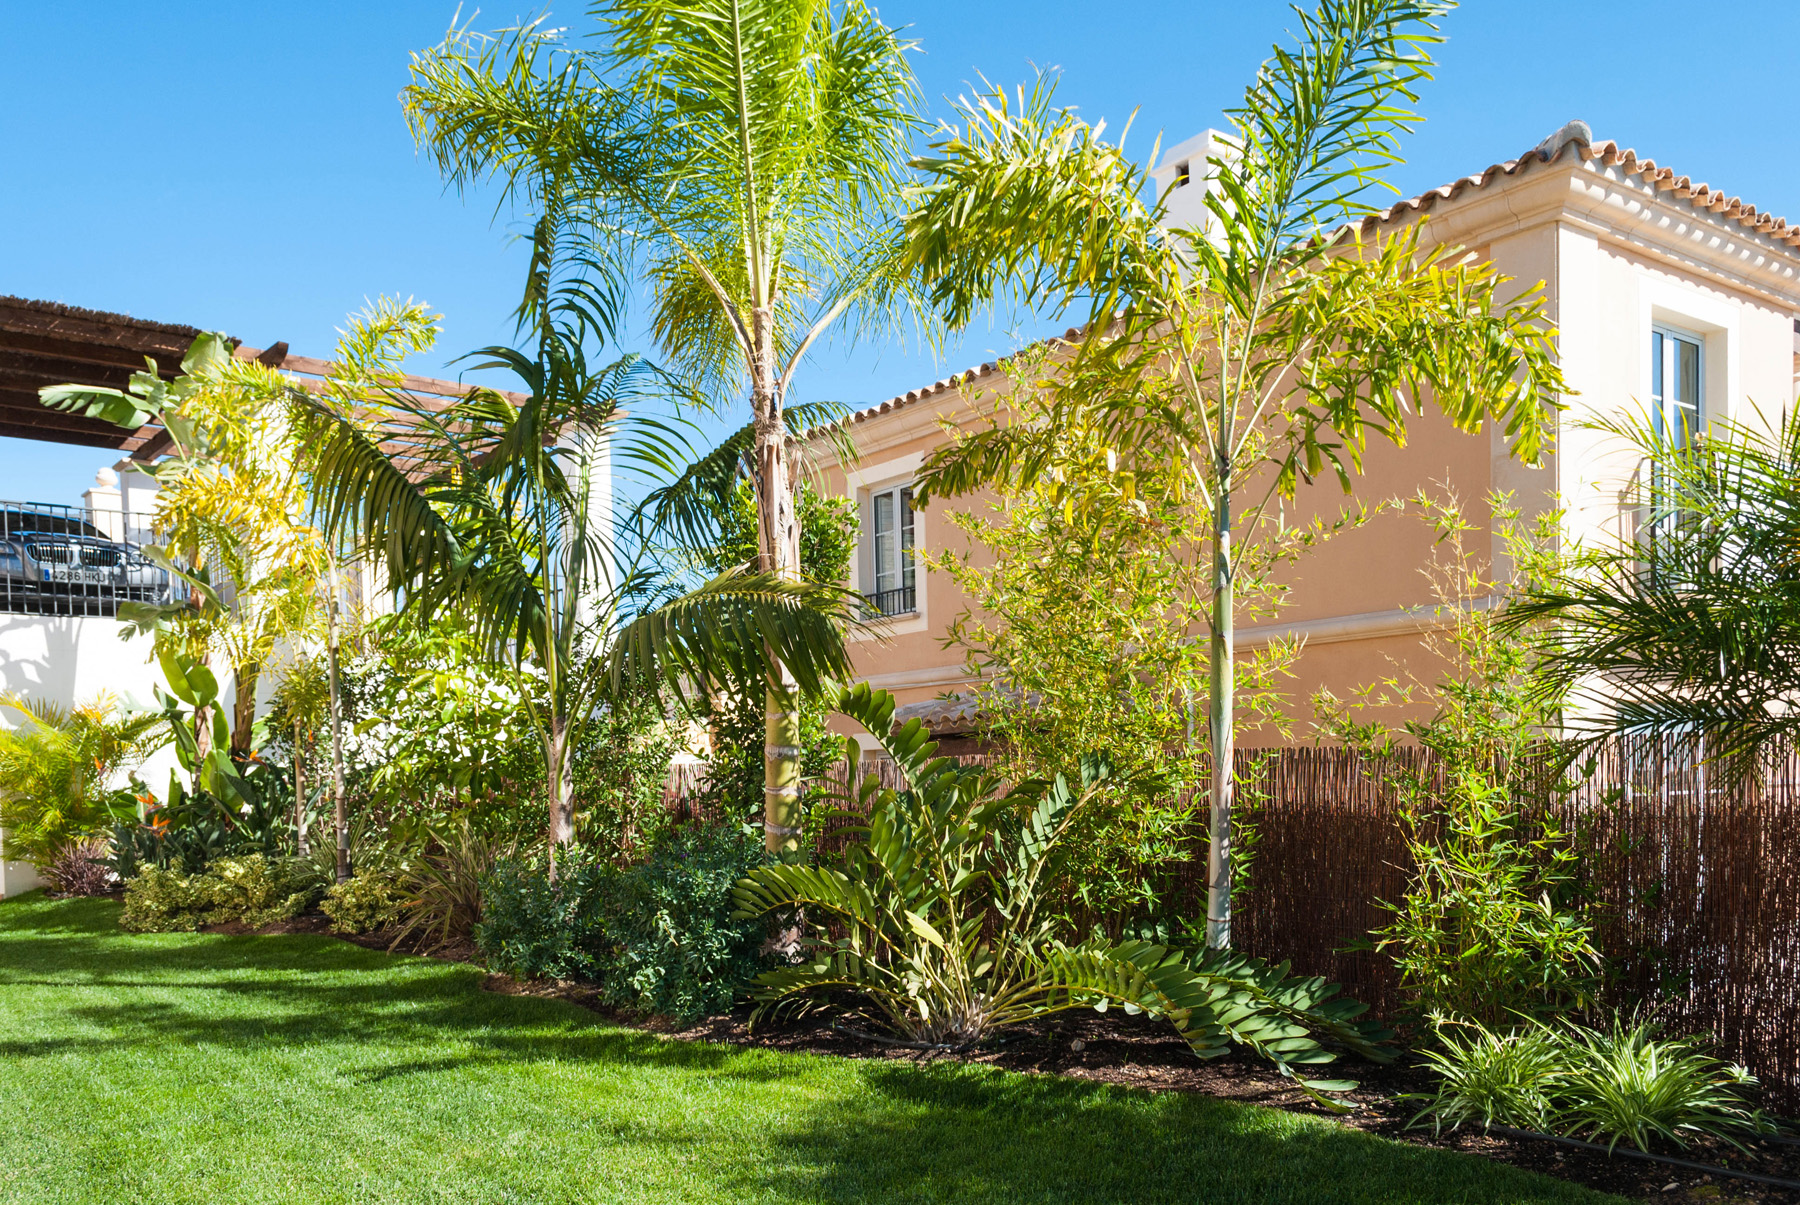 Diseno de jardin tropical david jim nez arquitectura y paisajismo en madrid - Diseno jardines madrid ...